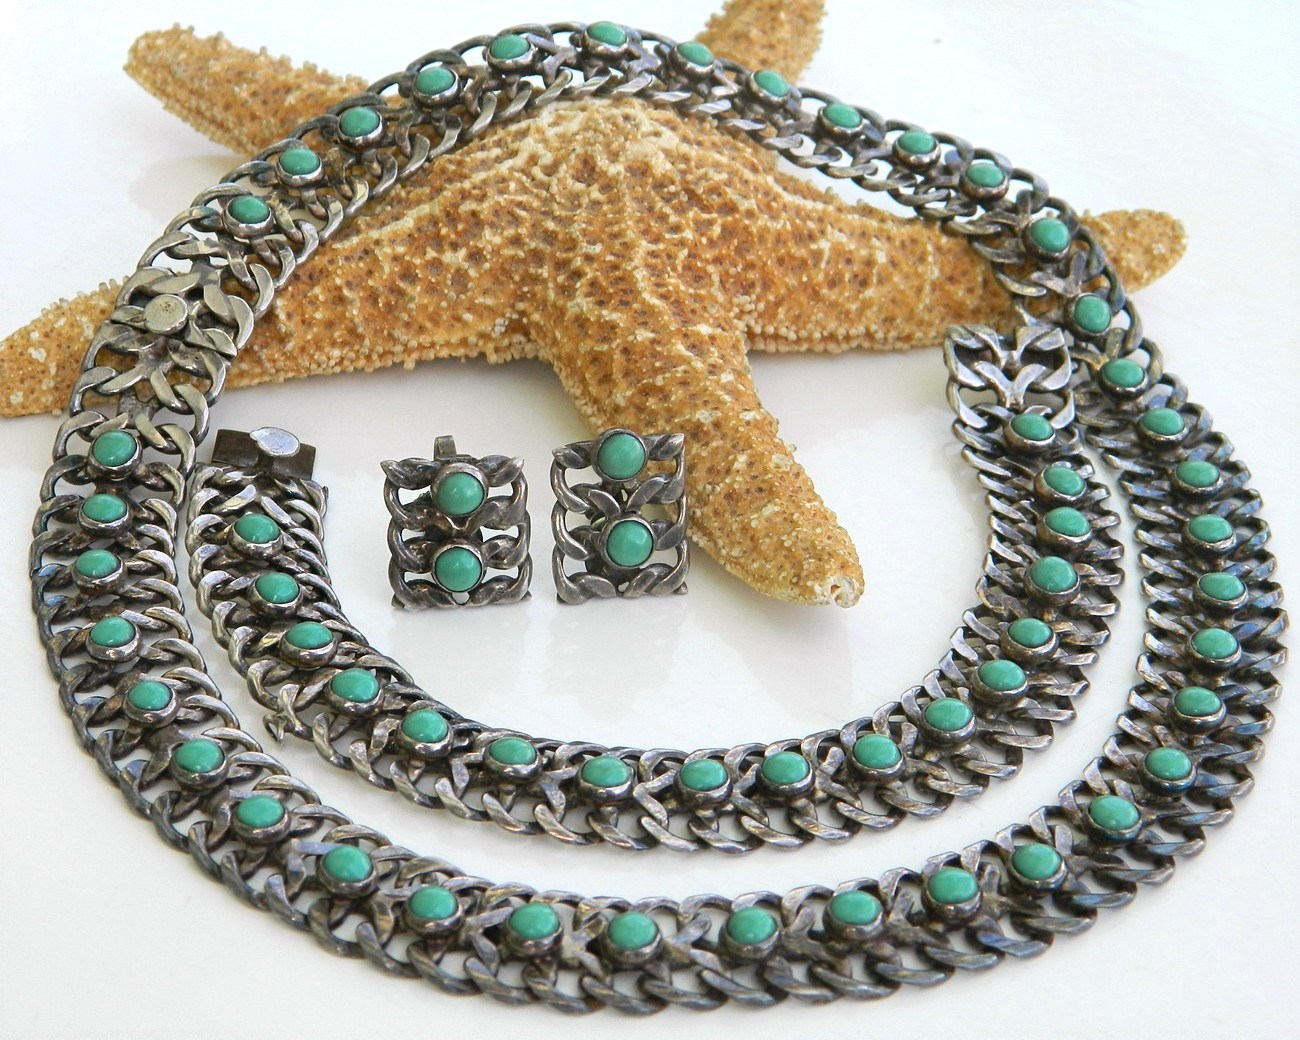 Farfan_mexico_3_piece_sterling_turquoise_necklace_set_parure_1940